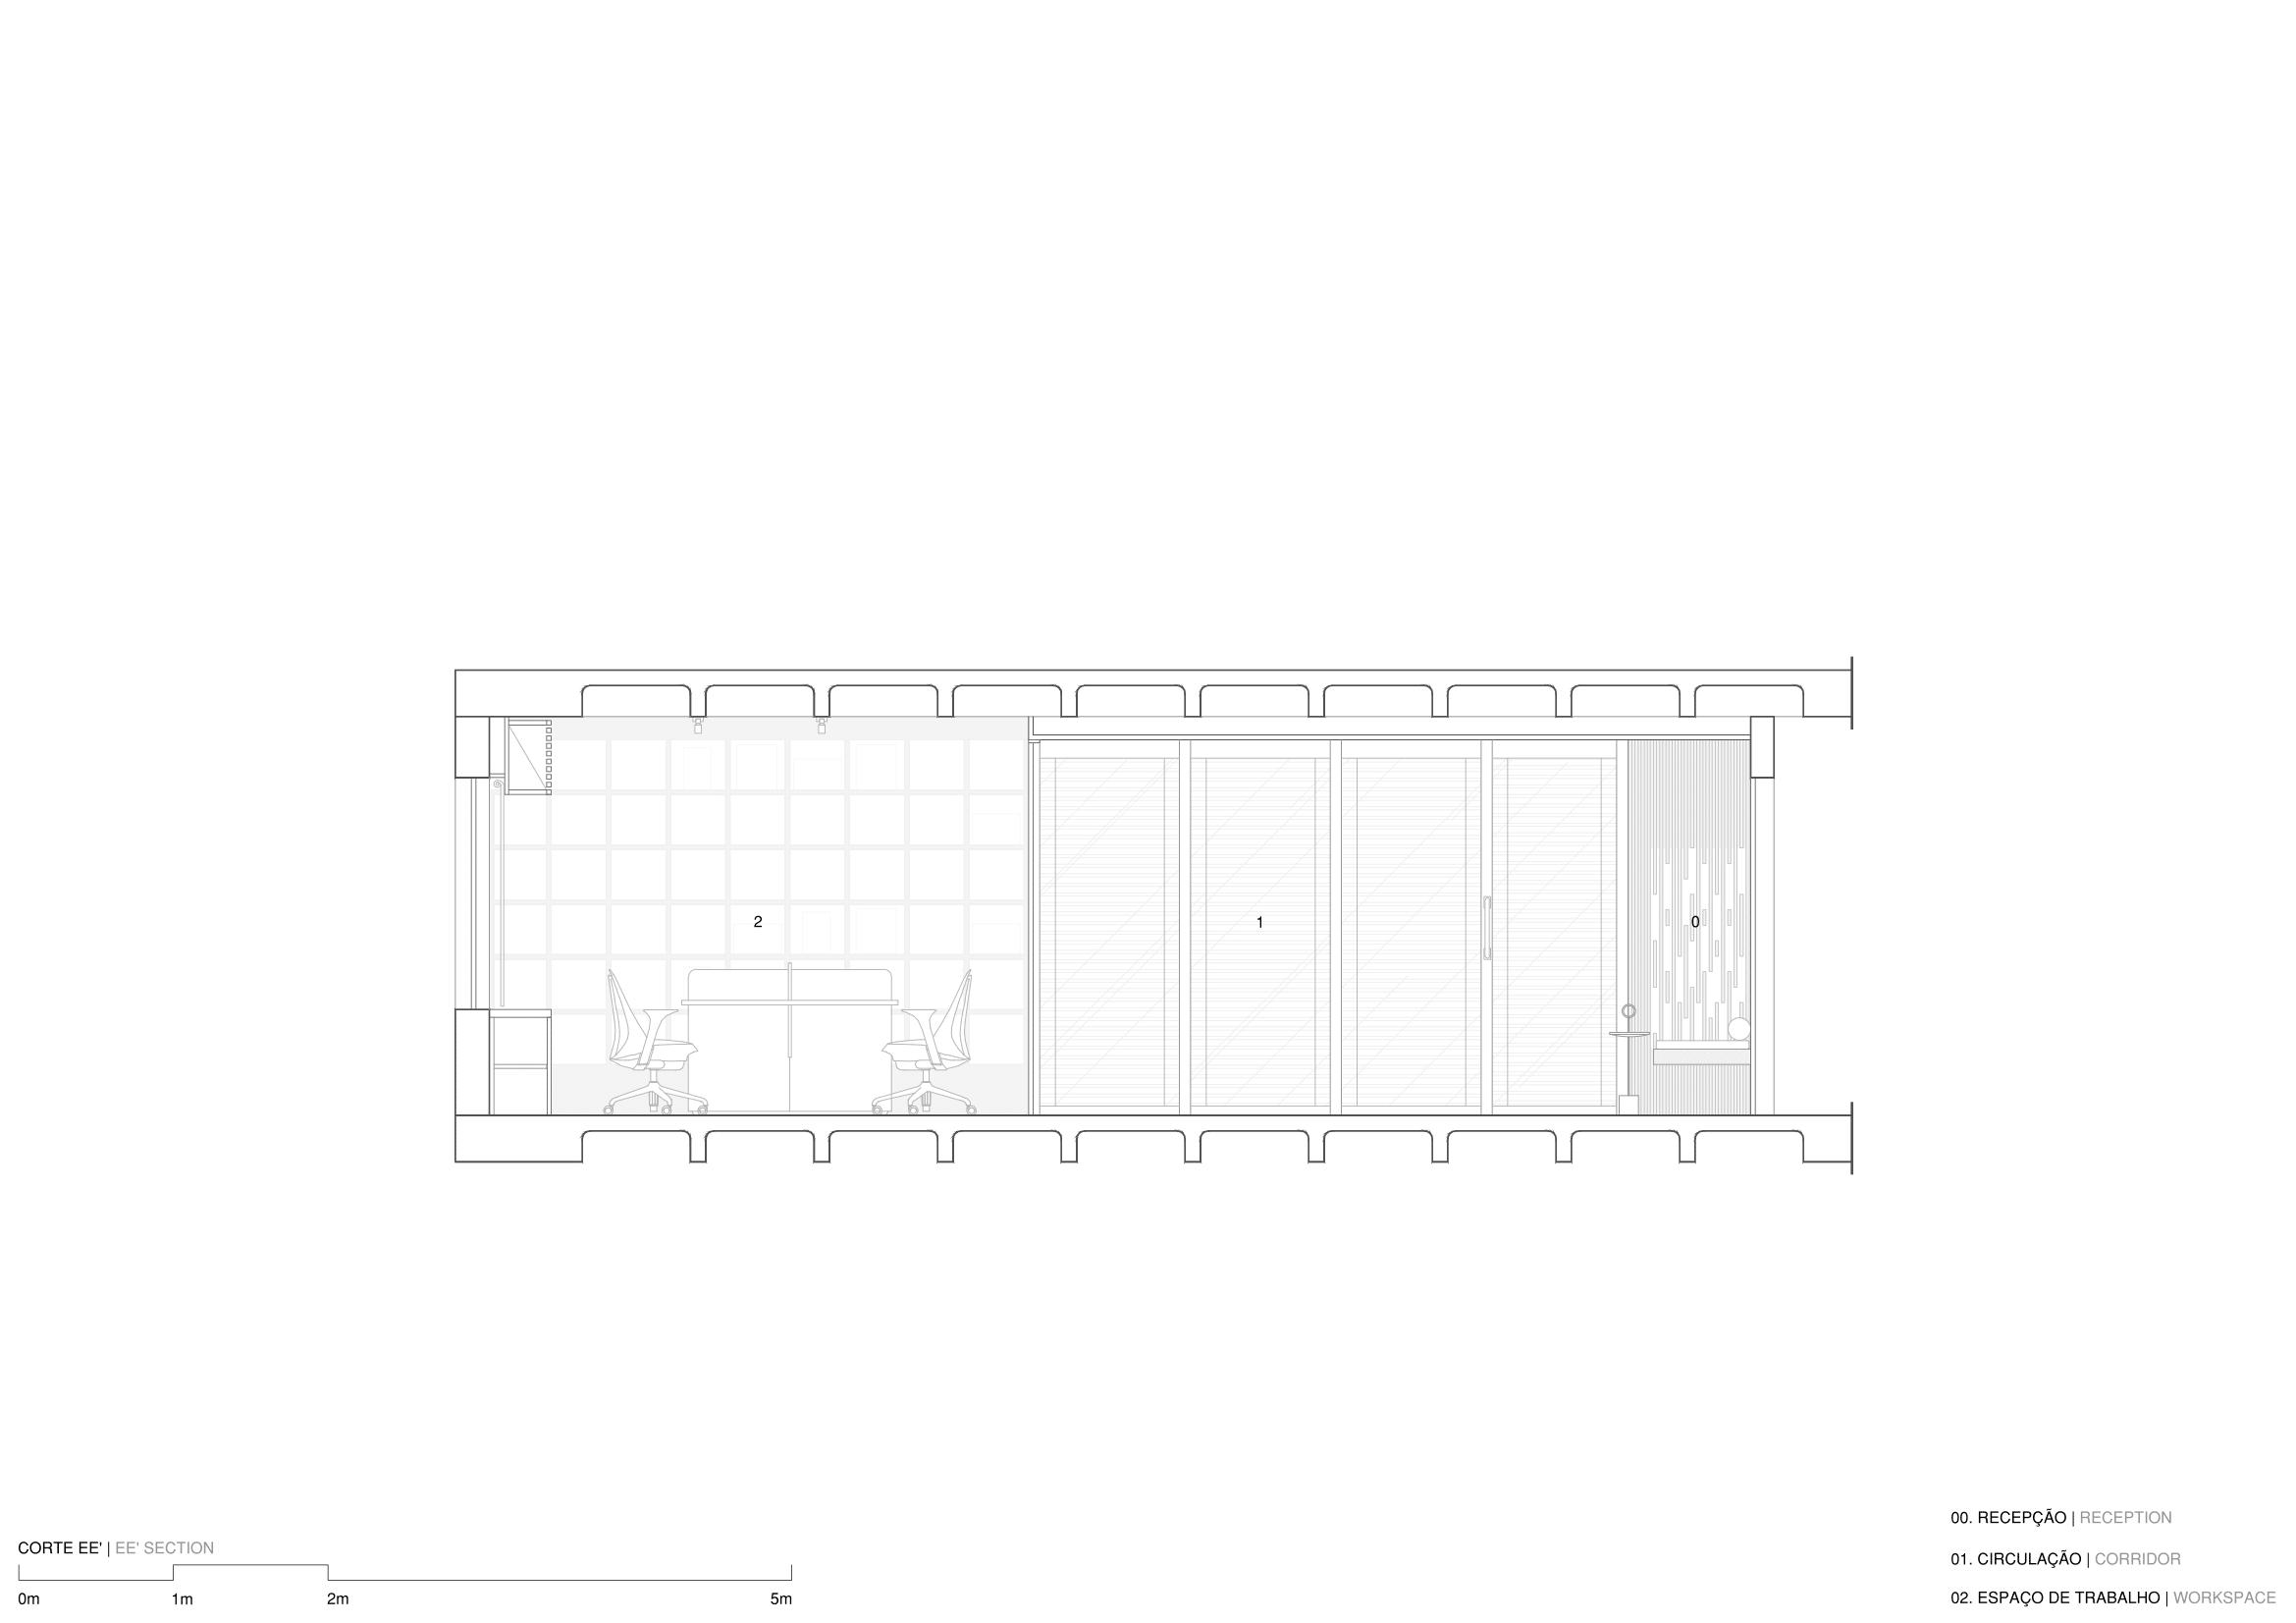 hobjeto-arquitetura-editora-zit-ap-06-corteee